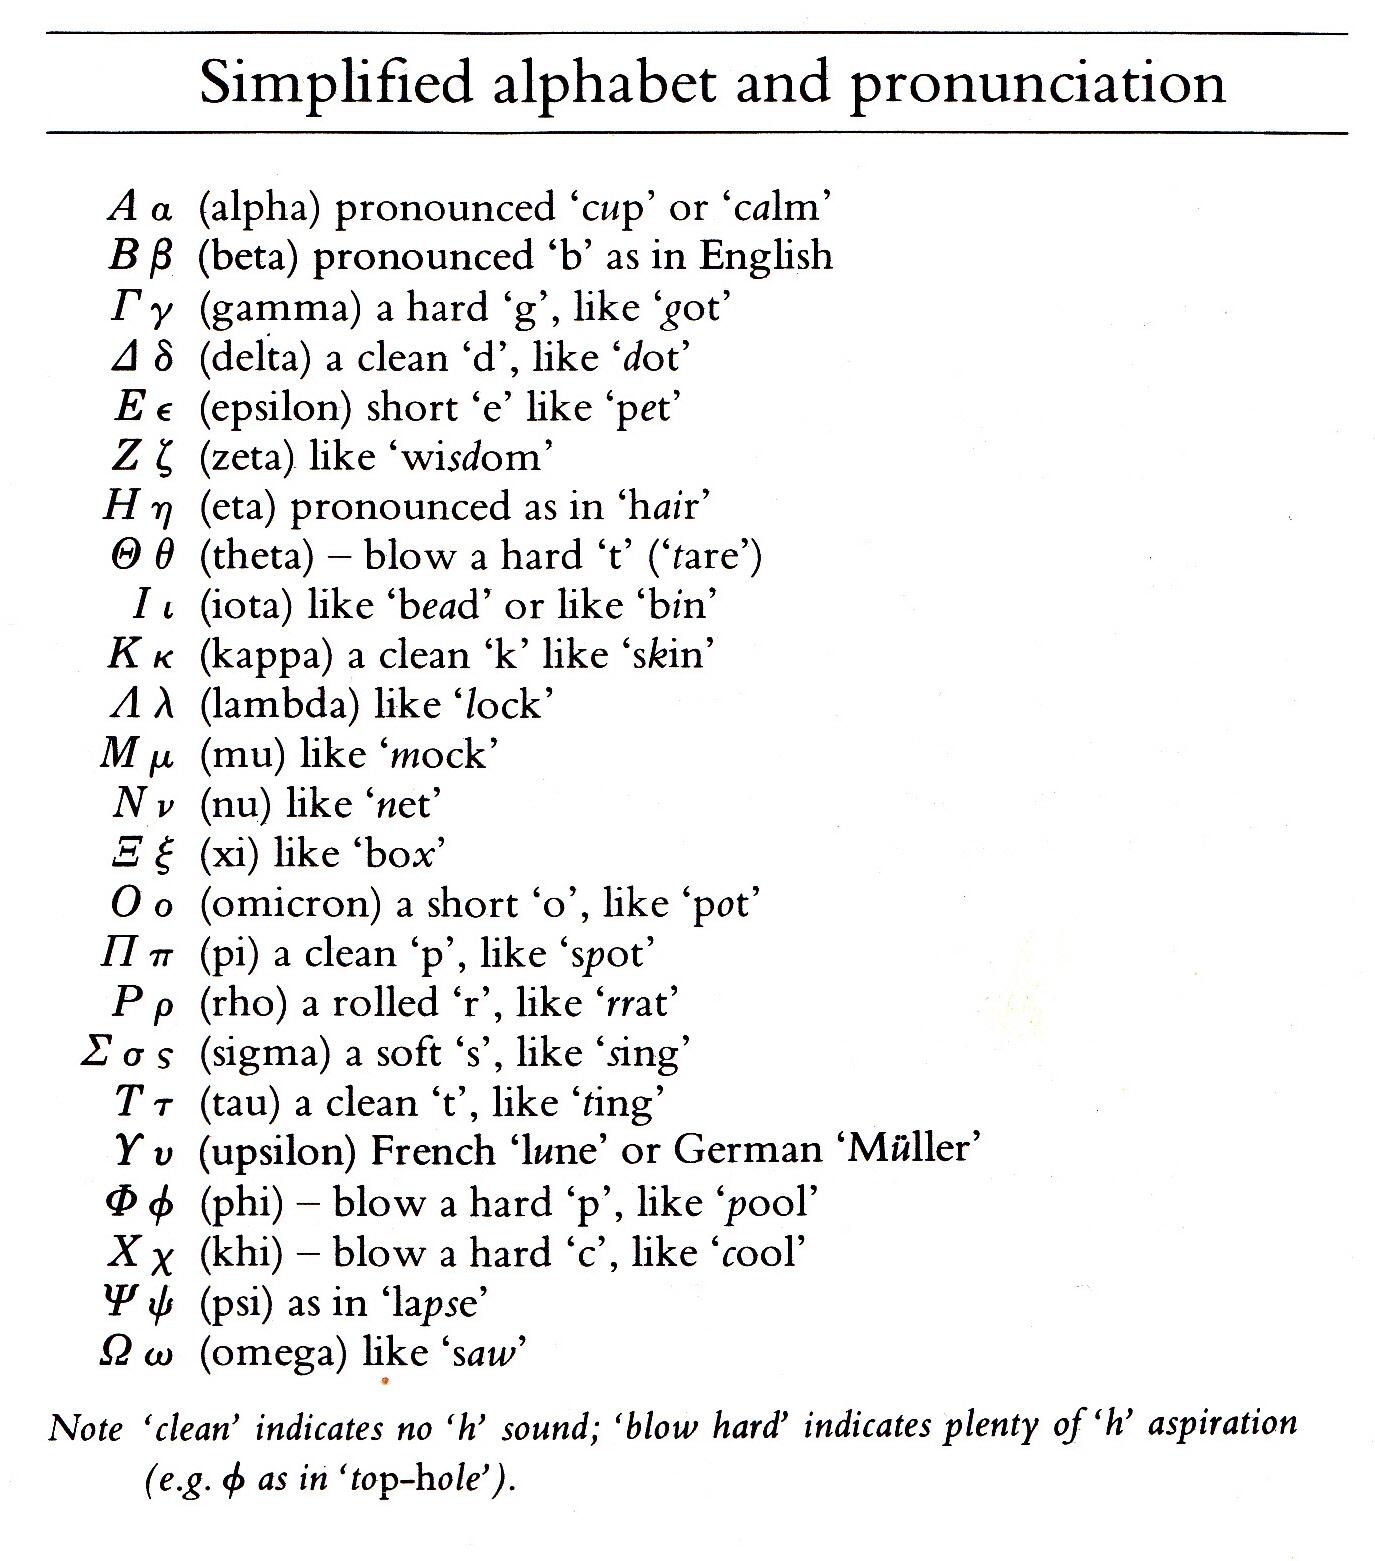 Tragic Patterns in Ancient Drama: Greek Alphabet Pronunciation